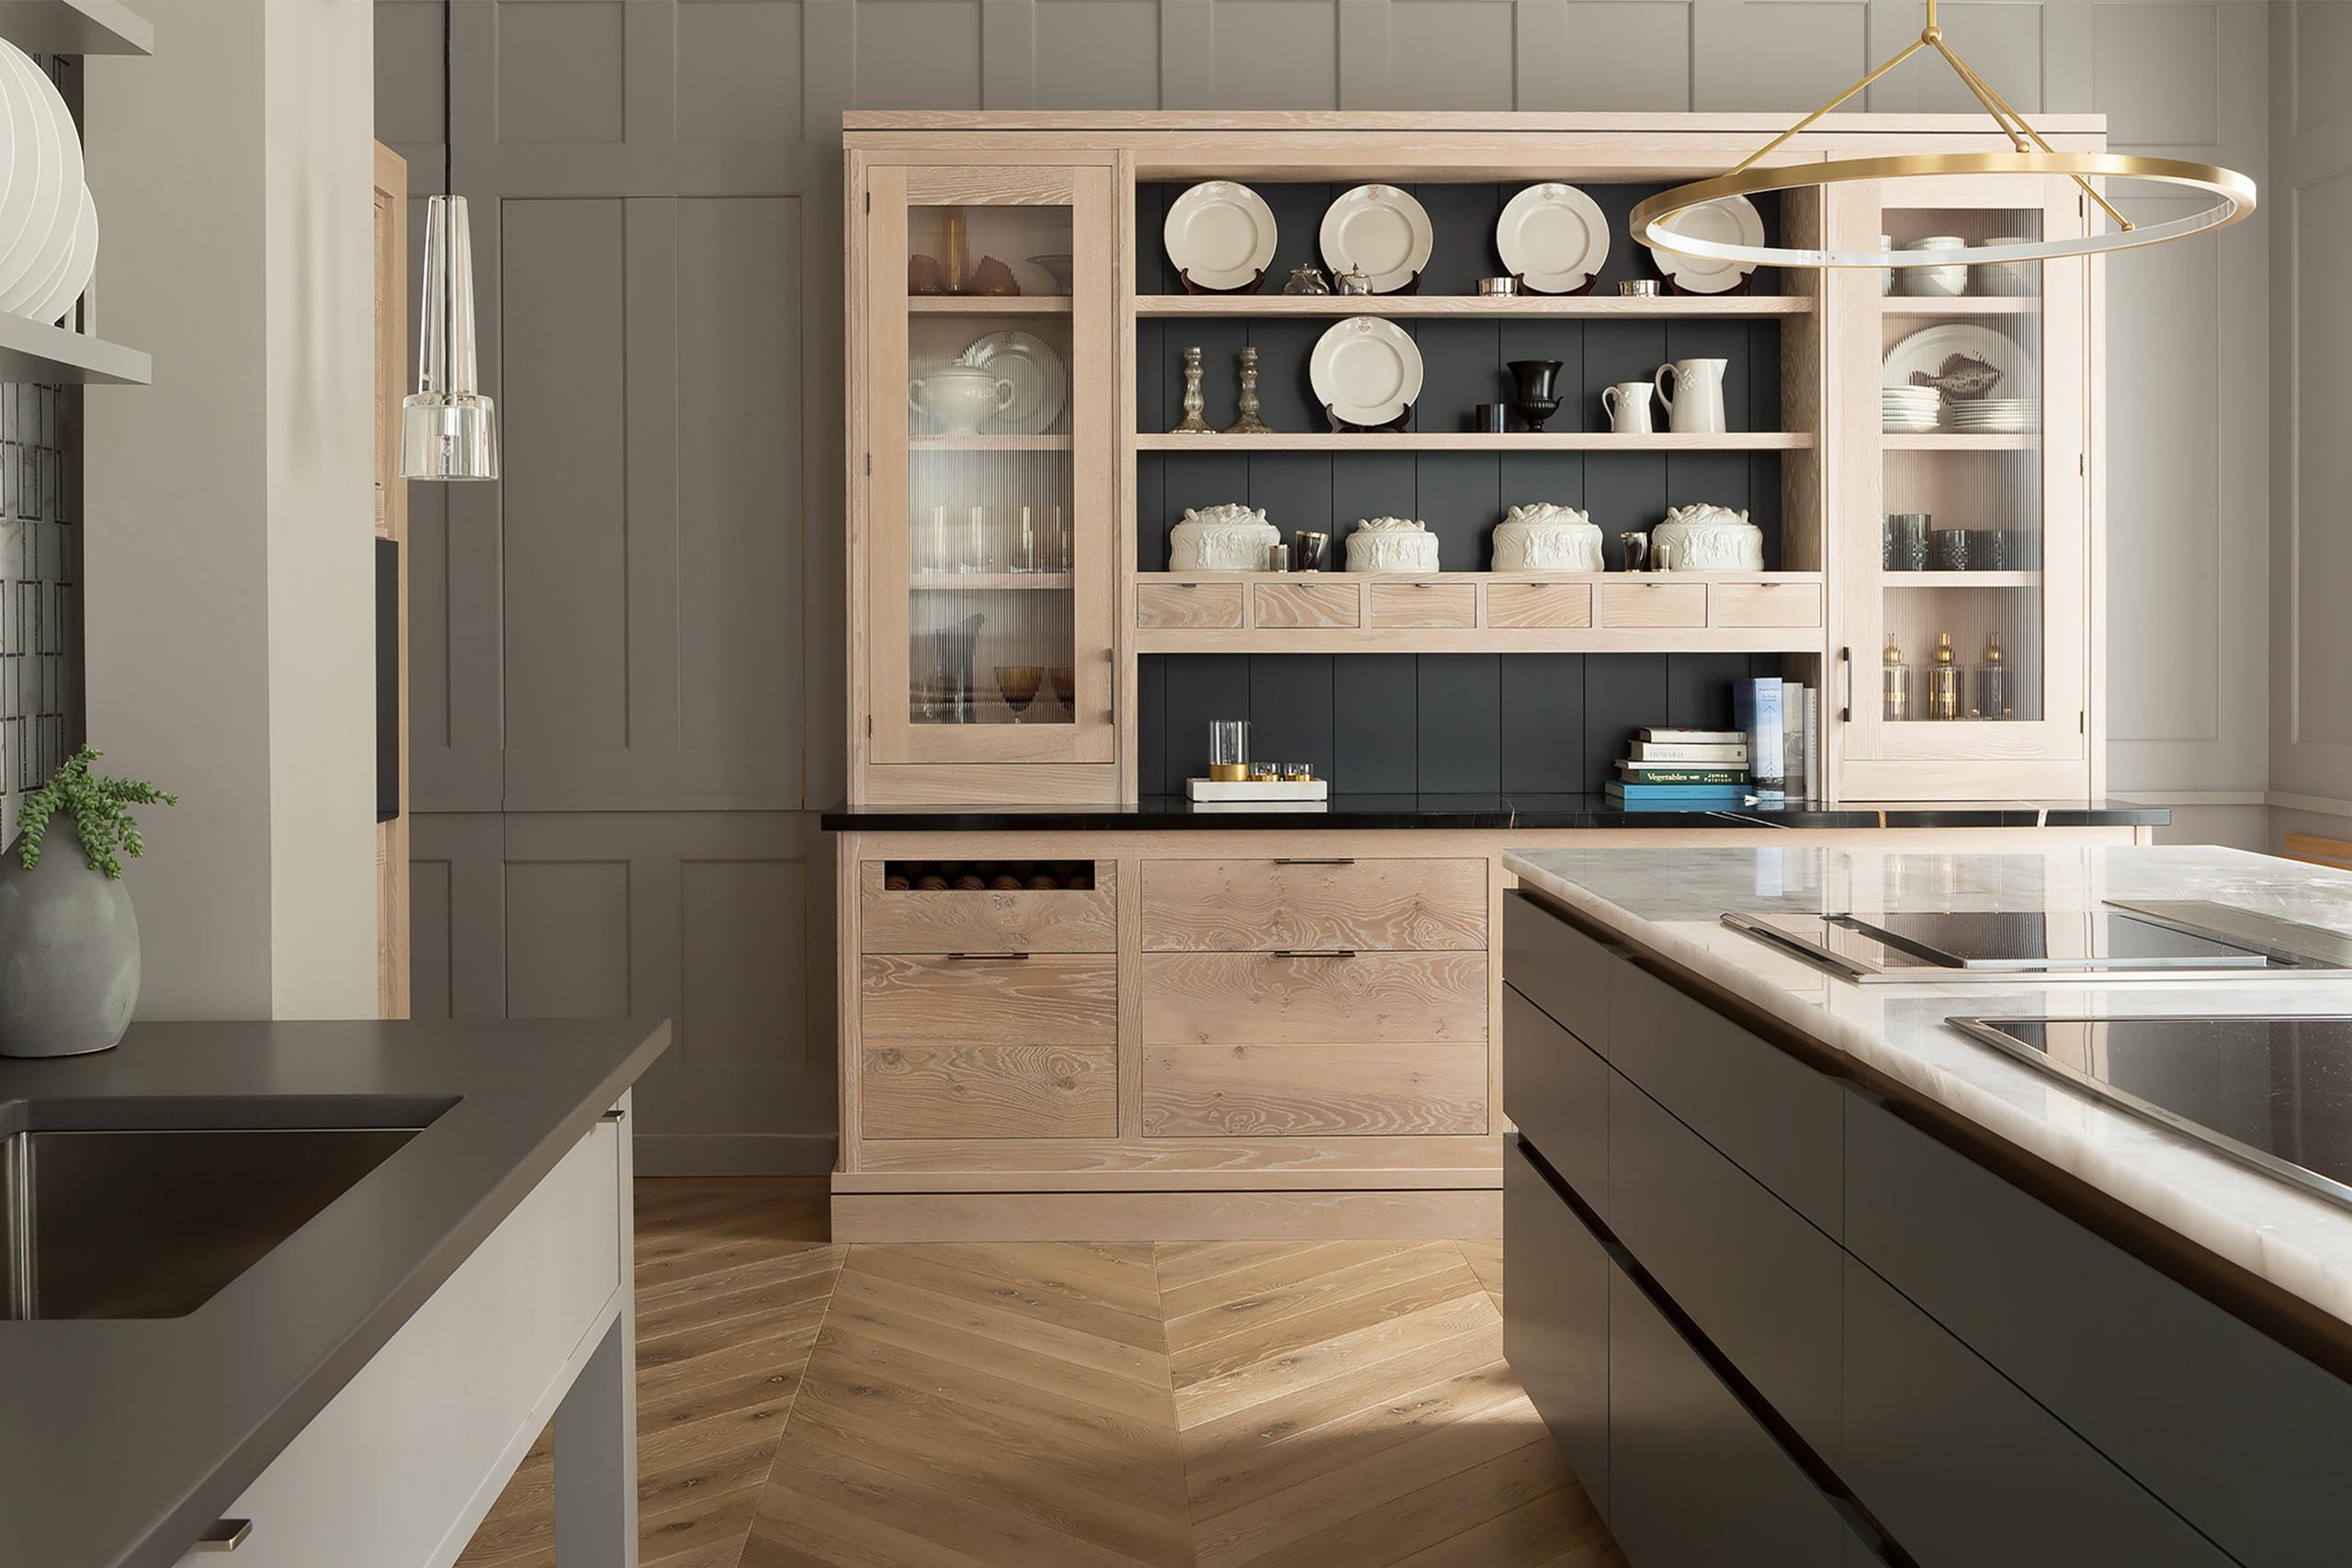 A Smallbone Brasserie kitchen with grey finish